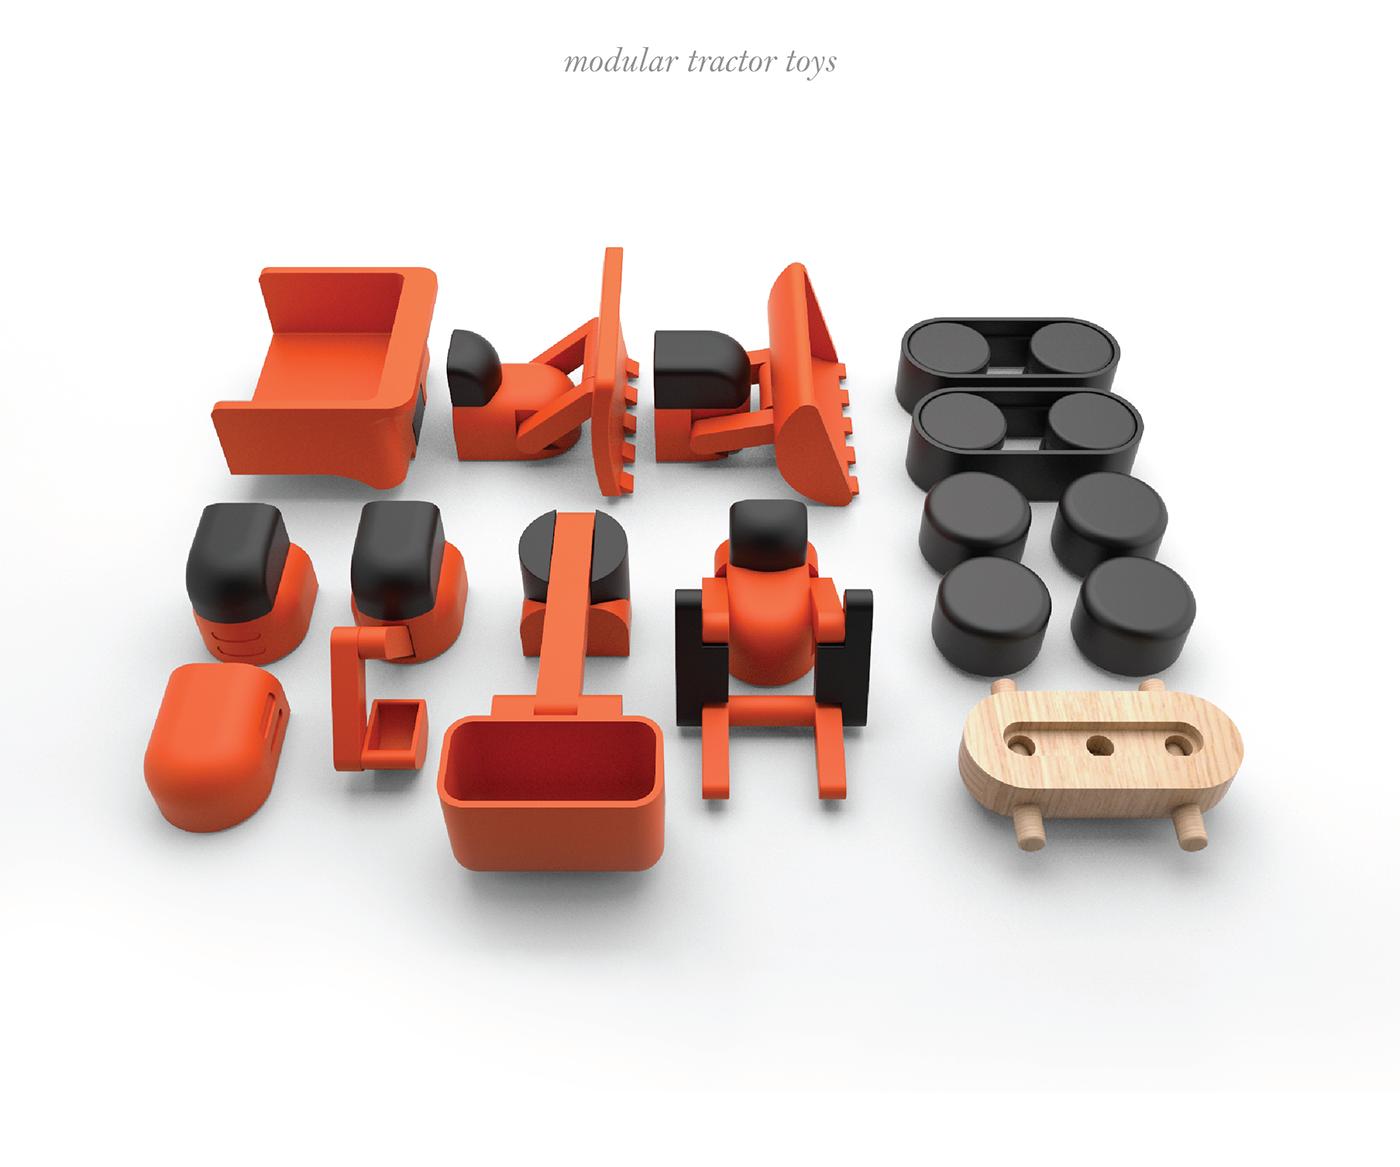 toys tractors modular wood wooden wheels Buckets trucks Truck Tractor